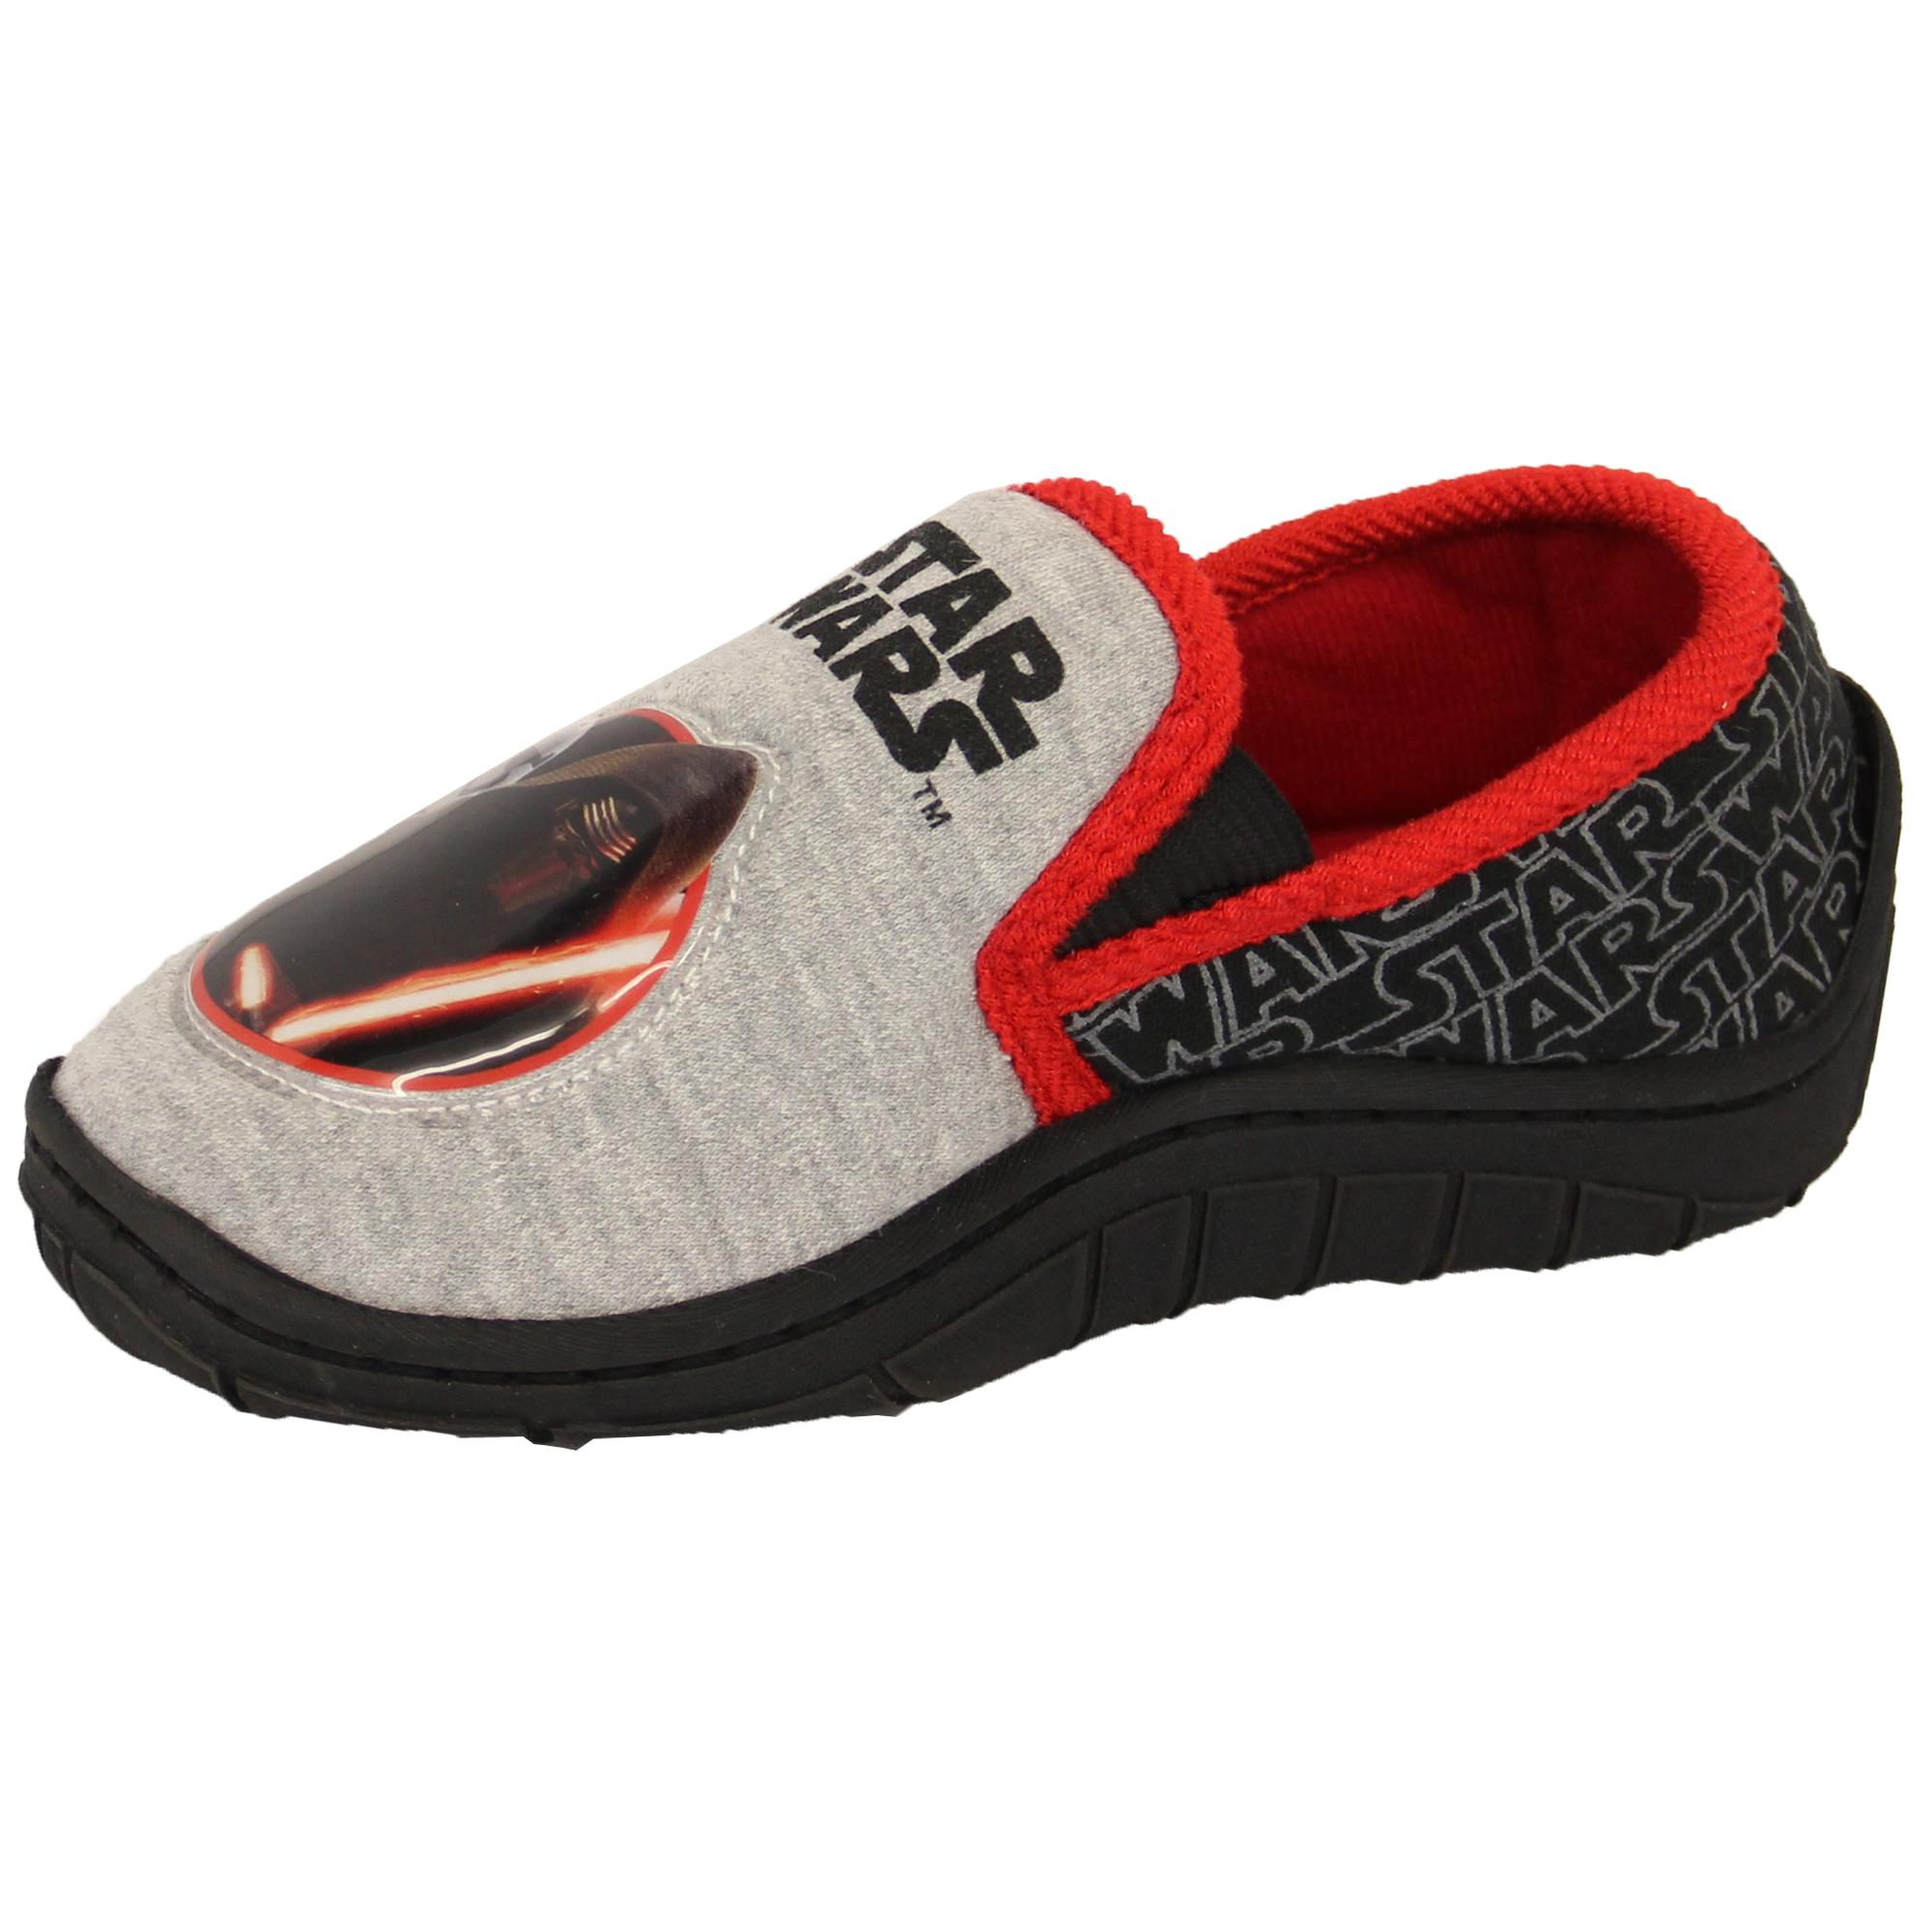 Boys-Girls-Shoes-Minion-Kids-Trainers-Star-Wars-Disney-Spiderman-Slipper thumbnail 19